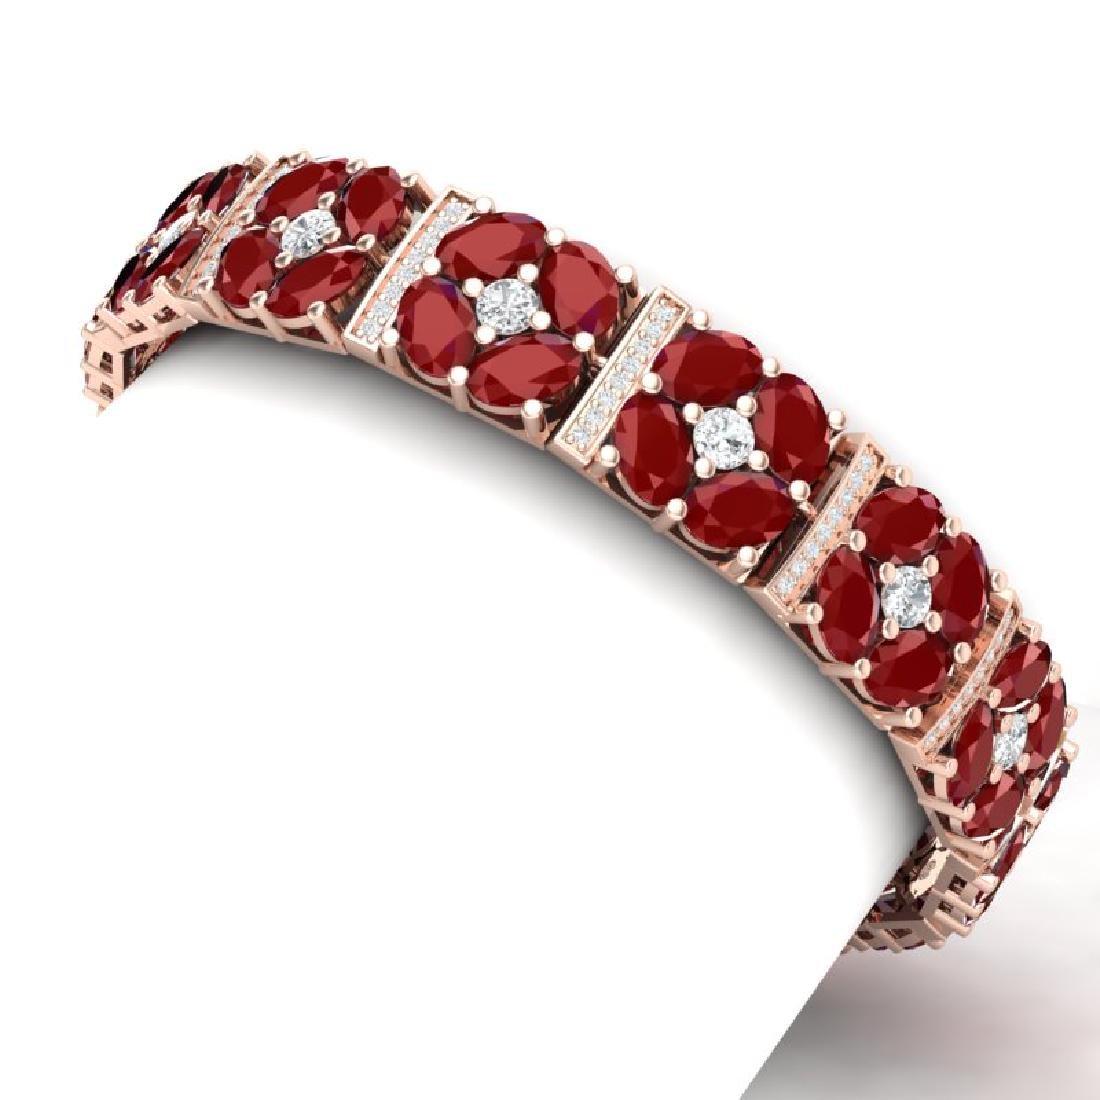 48.04 CTW Royalty Ruby & VS Diamond Bracelet 18K Rose - 2